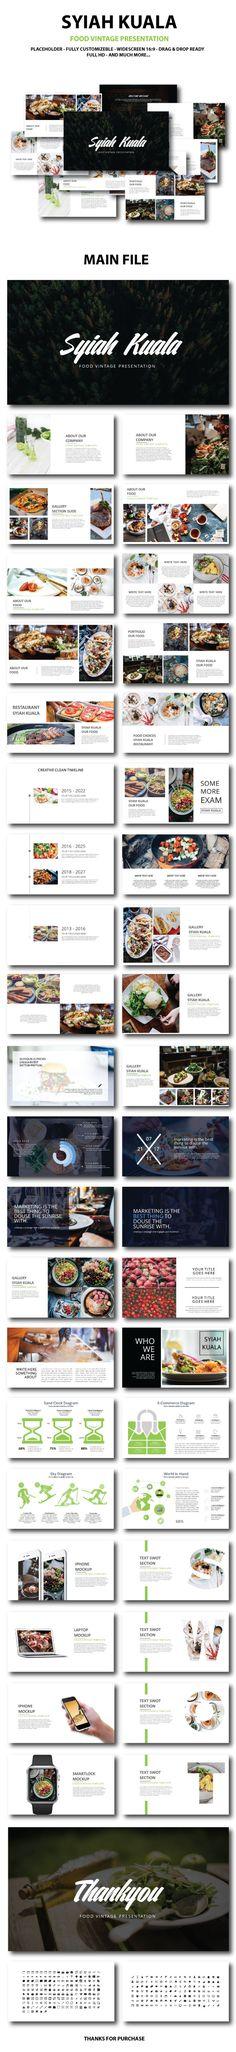 Syiah Kuala Presentation Template - PowerPoint Templates Presentation Templates